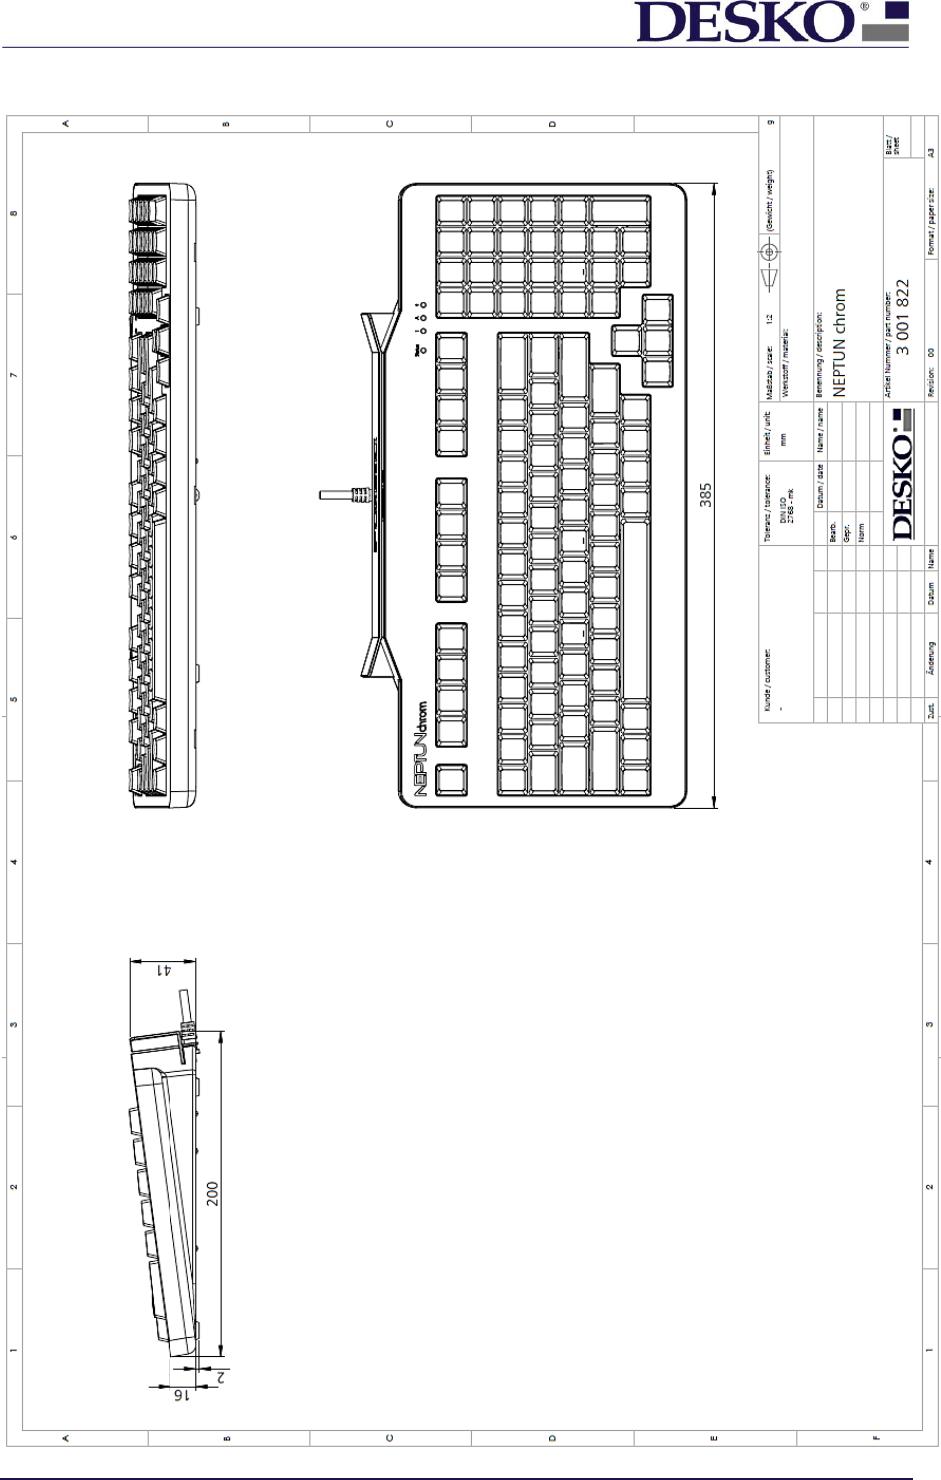 DESKO NEPTUN1 Keyboard with multiple Card Readers User Manual